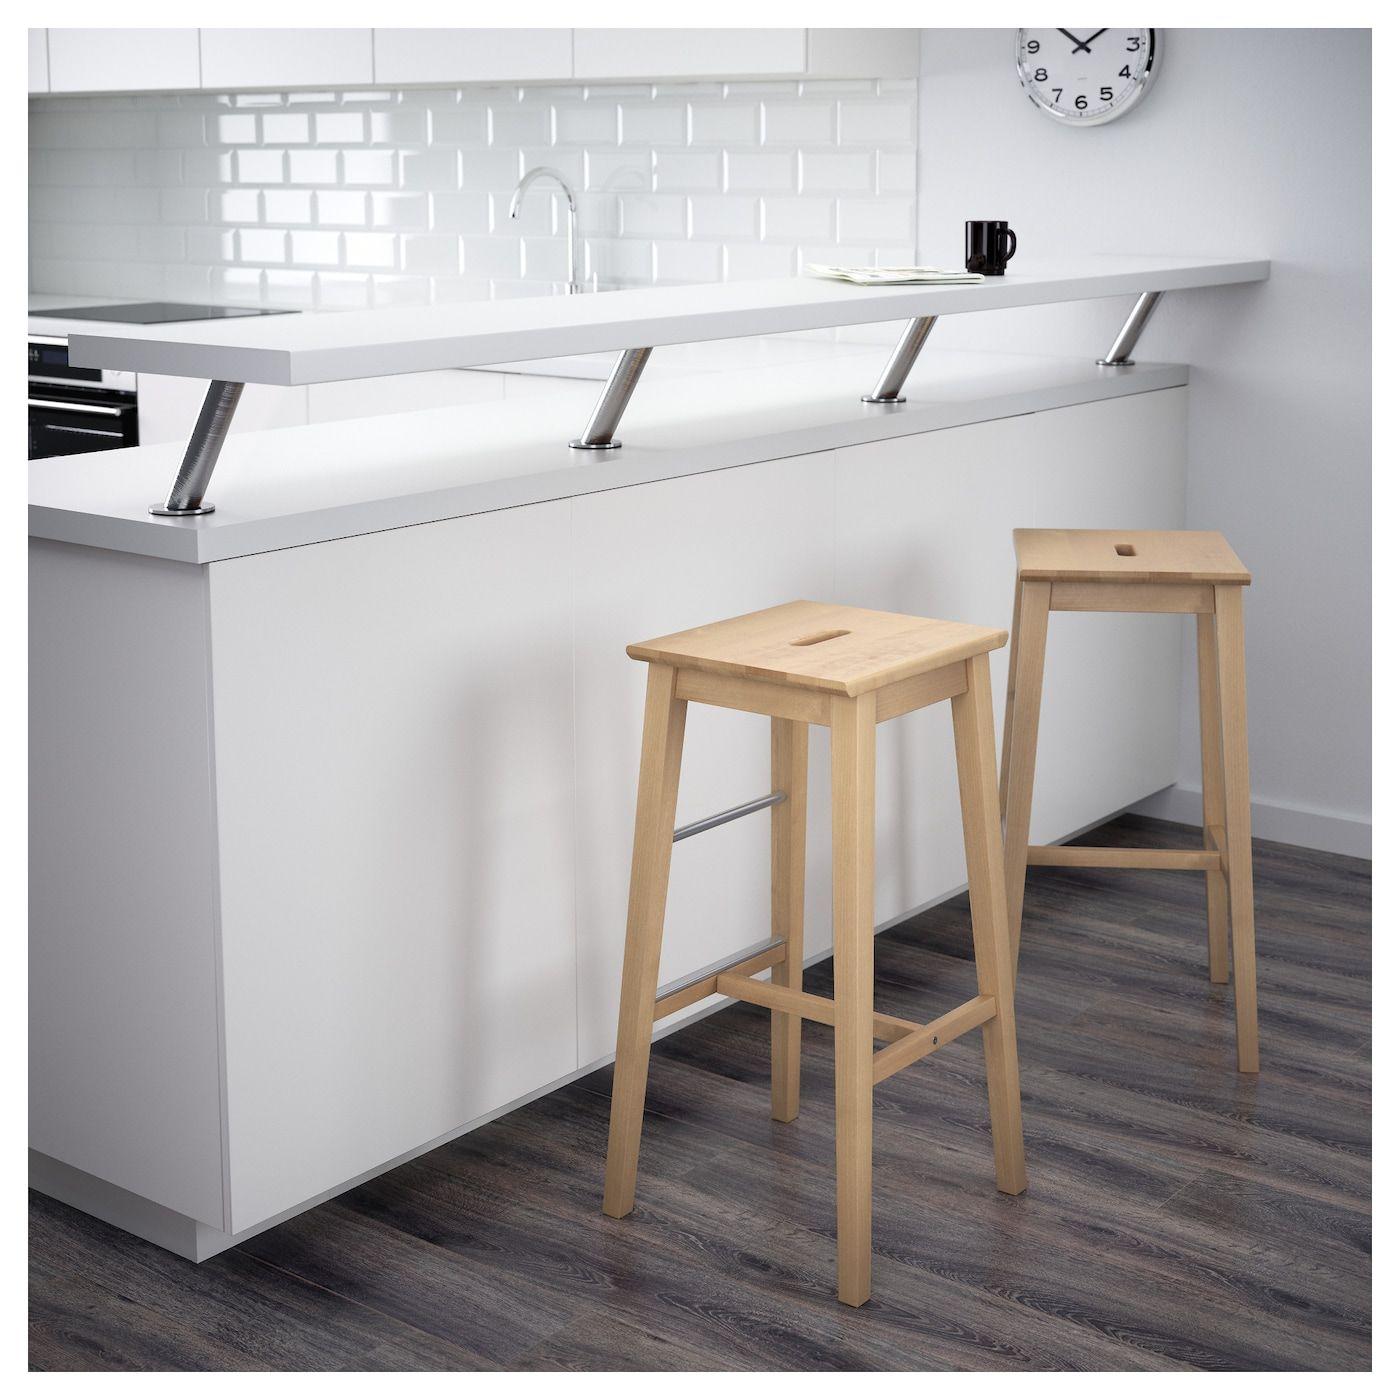 Nilsolle Tabouret De Bar Bouleau Ikea Tabouret De Bar Tabourets De Cuisine Du Bar Mobilier De Salon